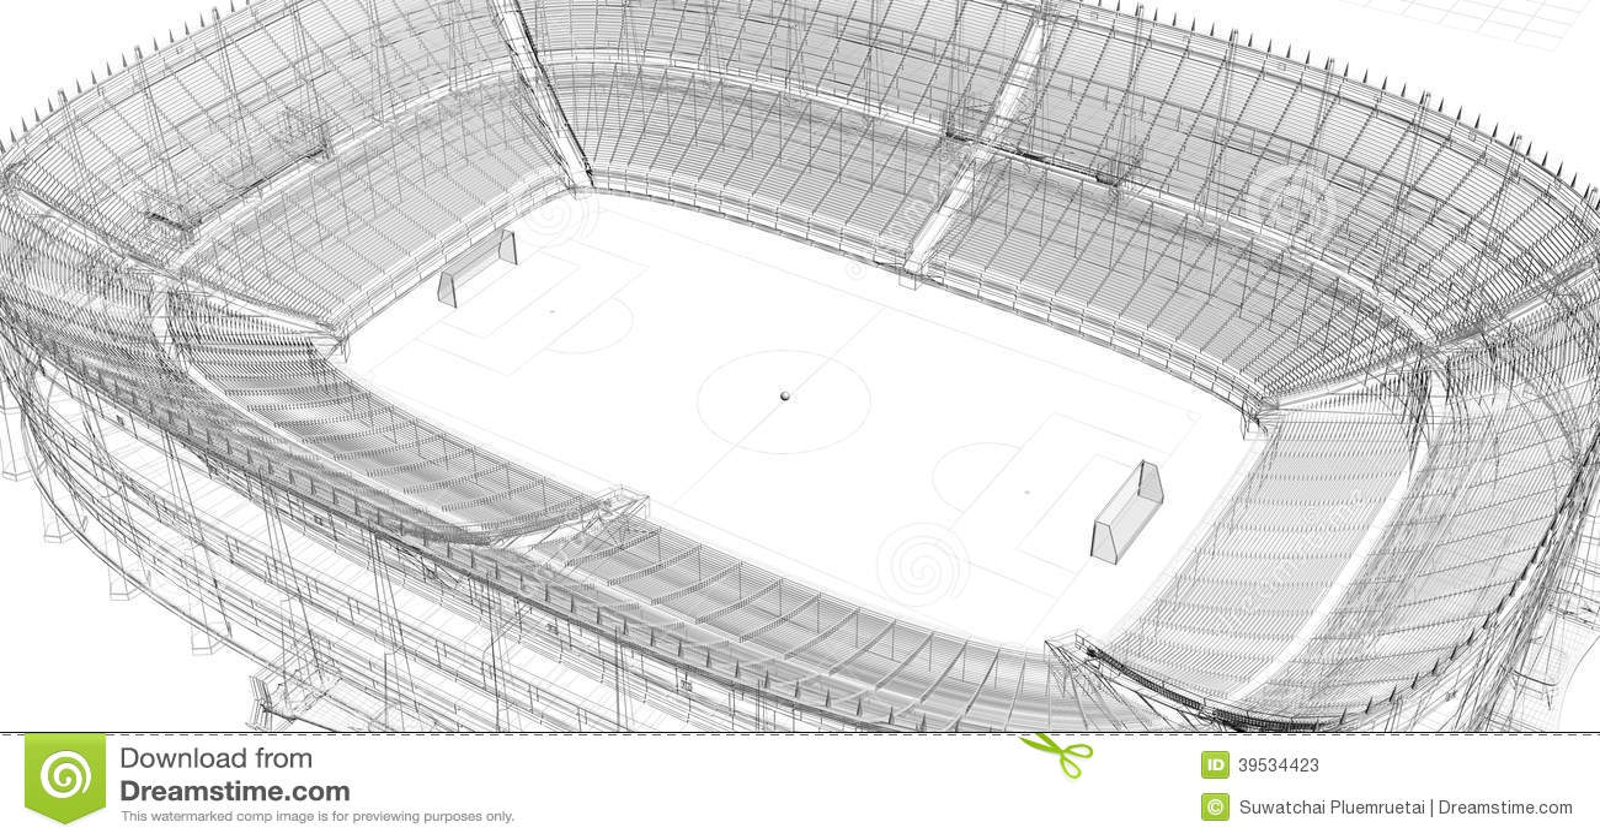 Kleurplaat Camp Nou Draadkader Van Voetbal Of Voetbalstadion Stock Illustratie